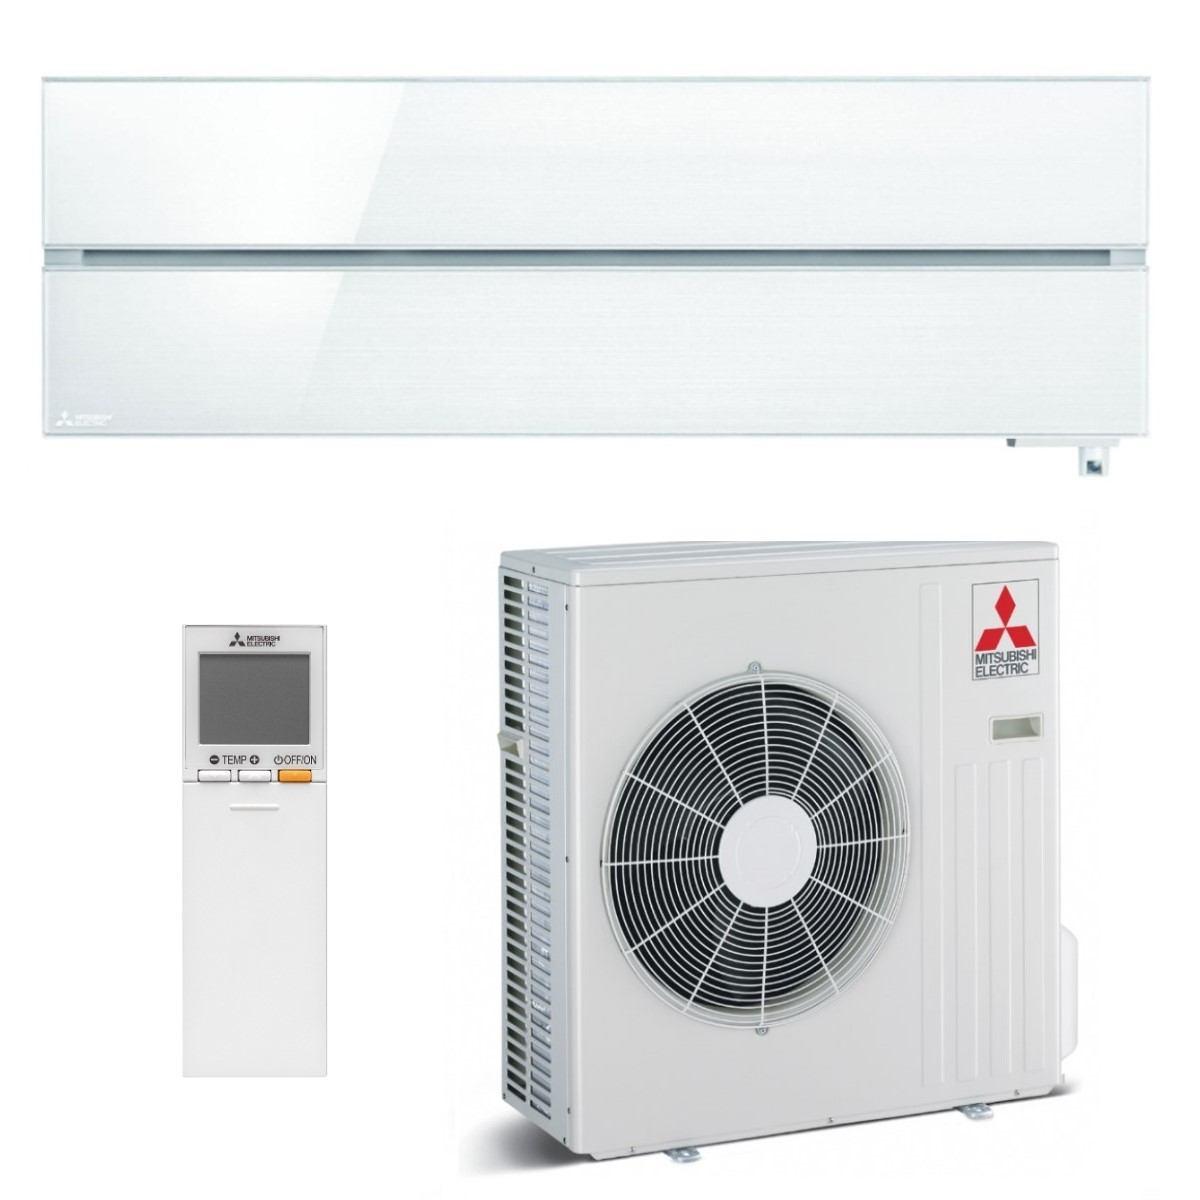 MITSUBISHI ELECTRIC KLIMA UREĐAJ MSZ-LN60VGW/MUZ-LN60VG R-32